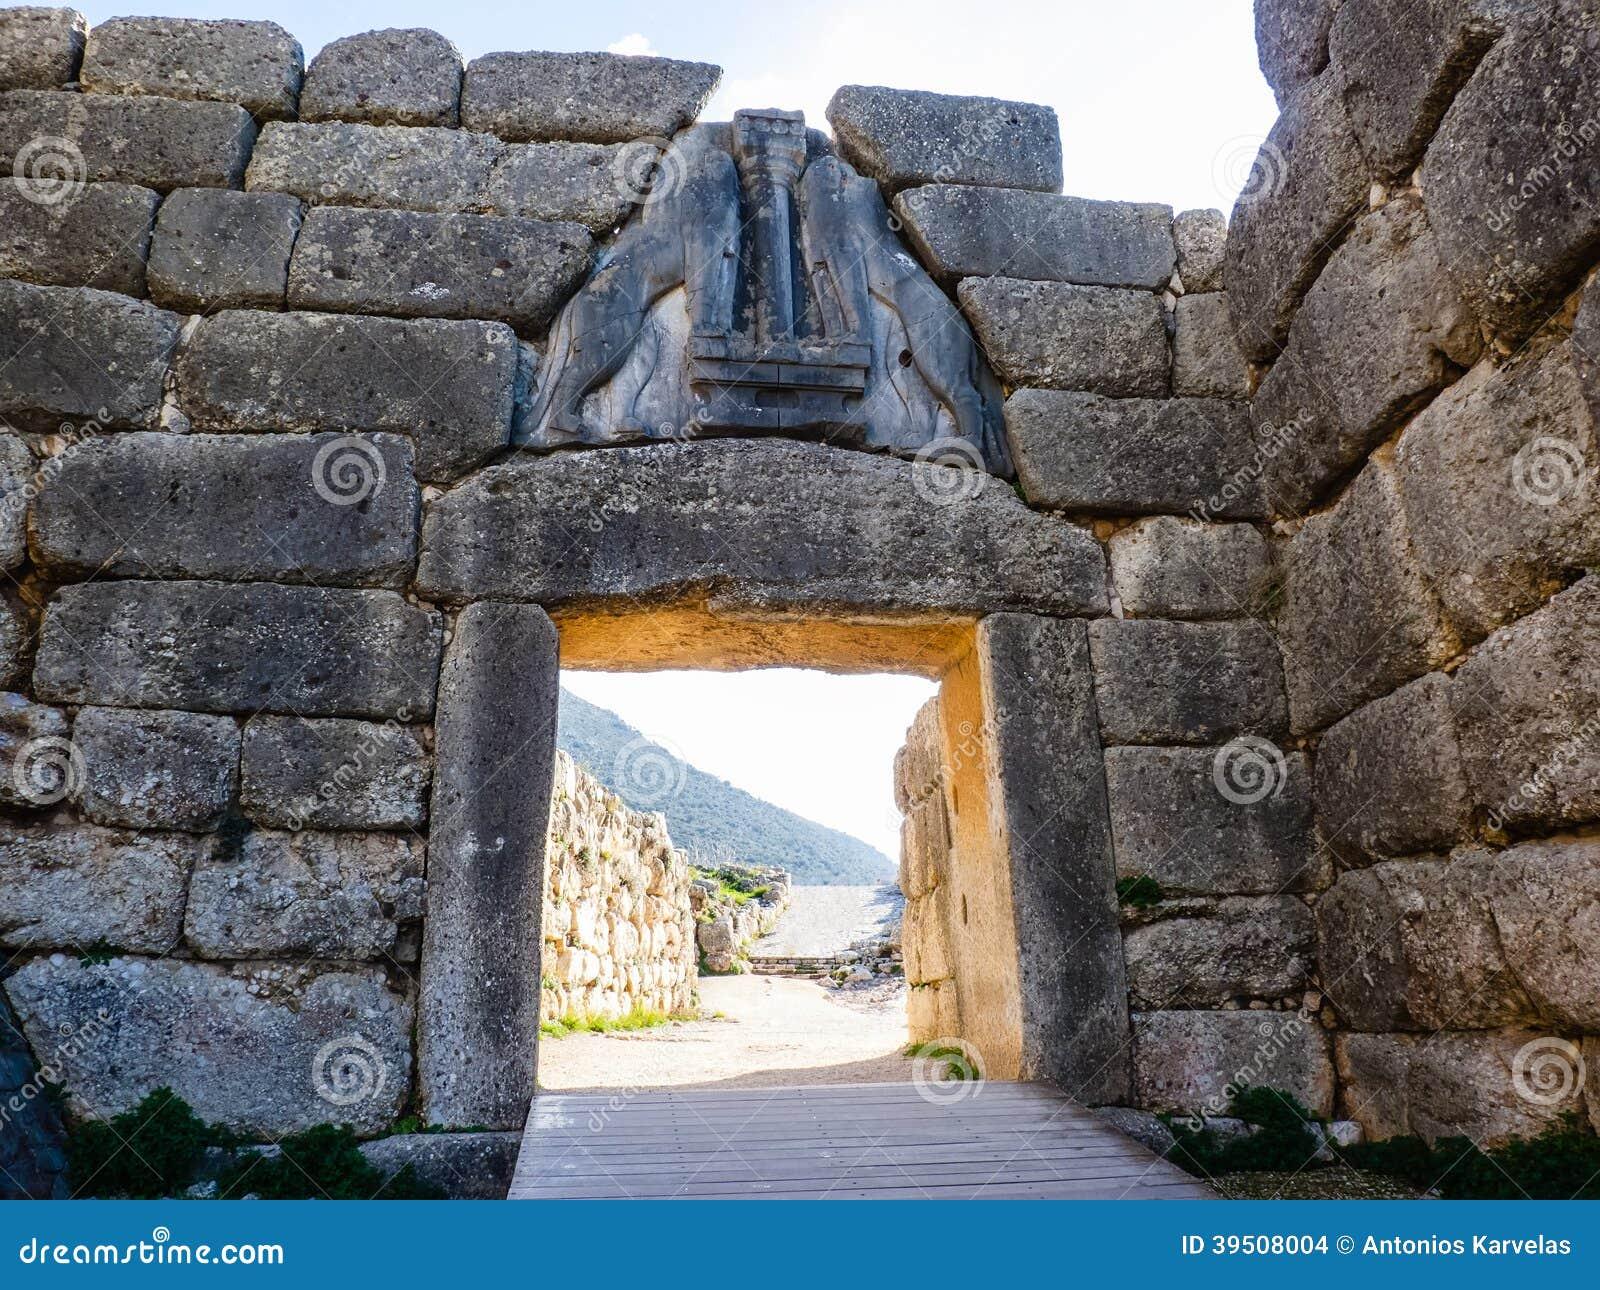 The Lion gate in Mykines, Greece